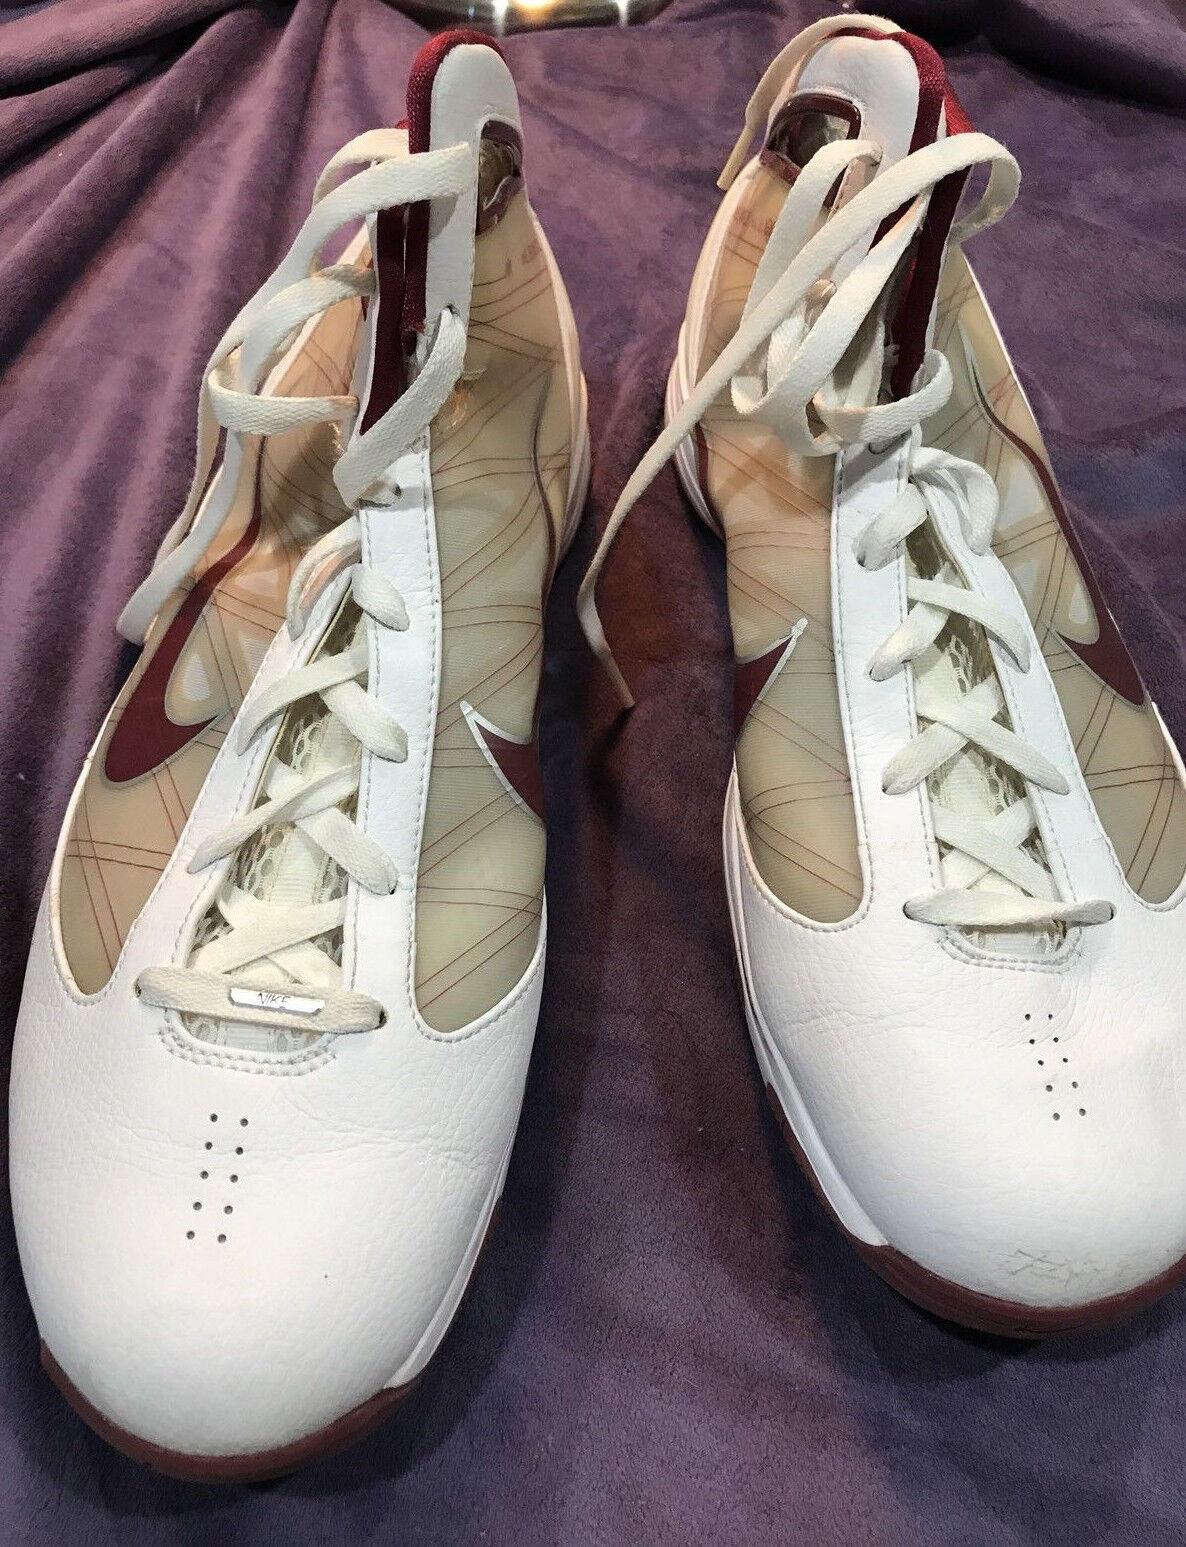 Nike Hyperize Flywire Men White / Maroon High Top Basketball Sneaker Shoe 15